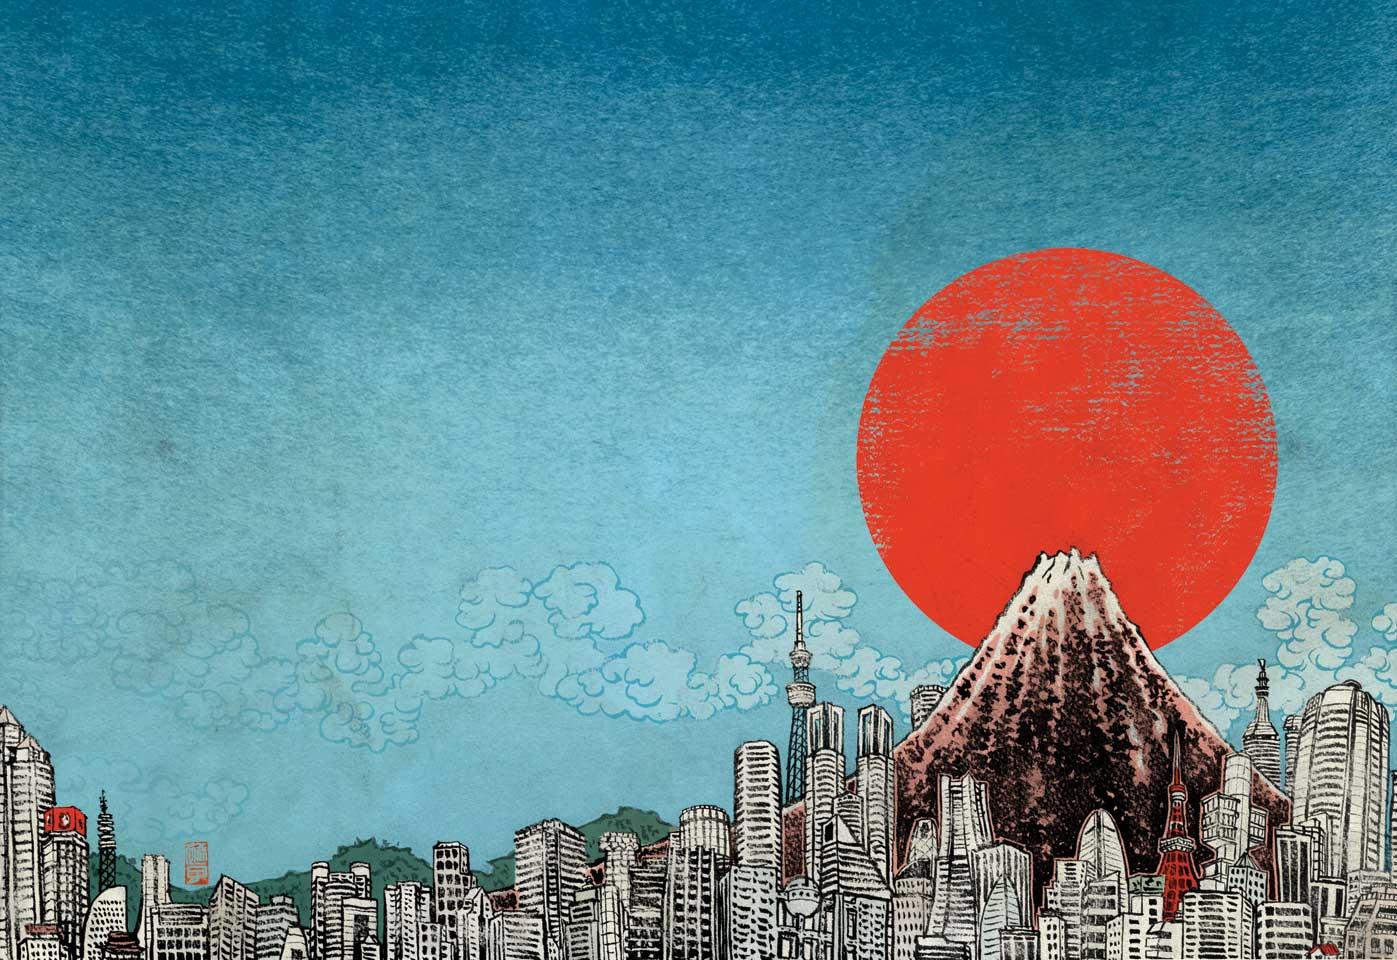 Best Book Cover In Japan : Reimagining japan book cover yuko shimizu